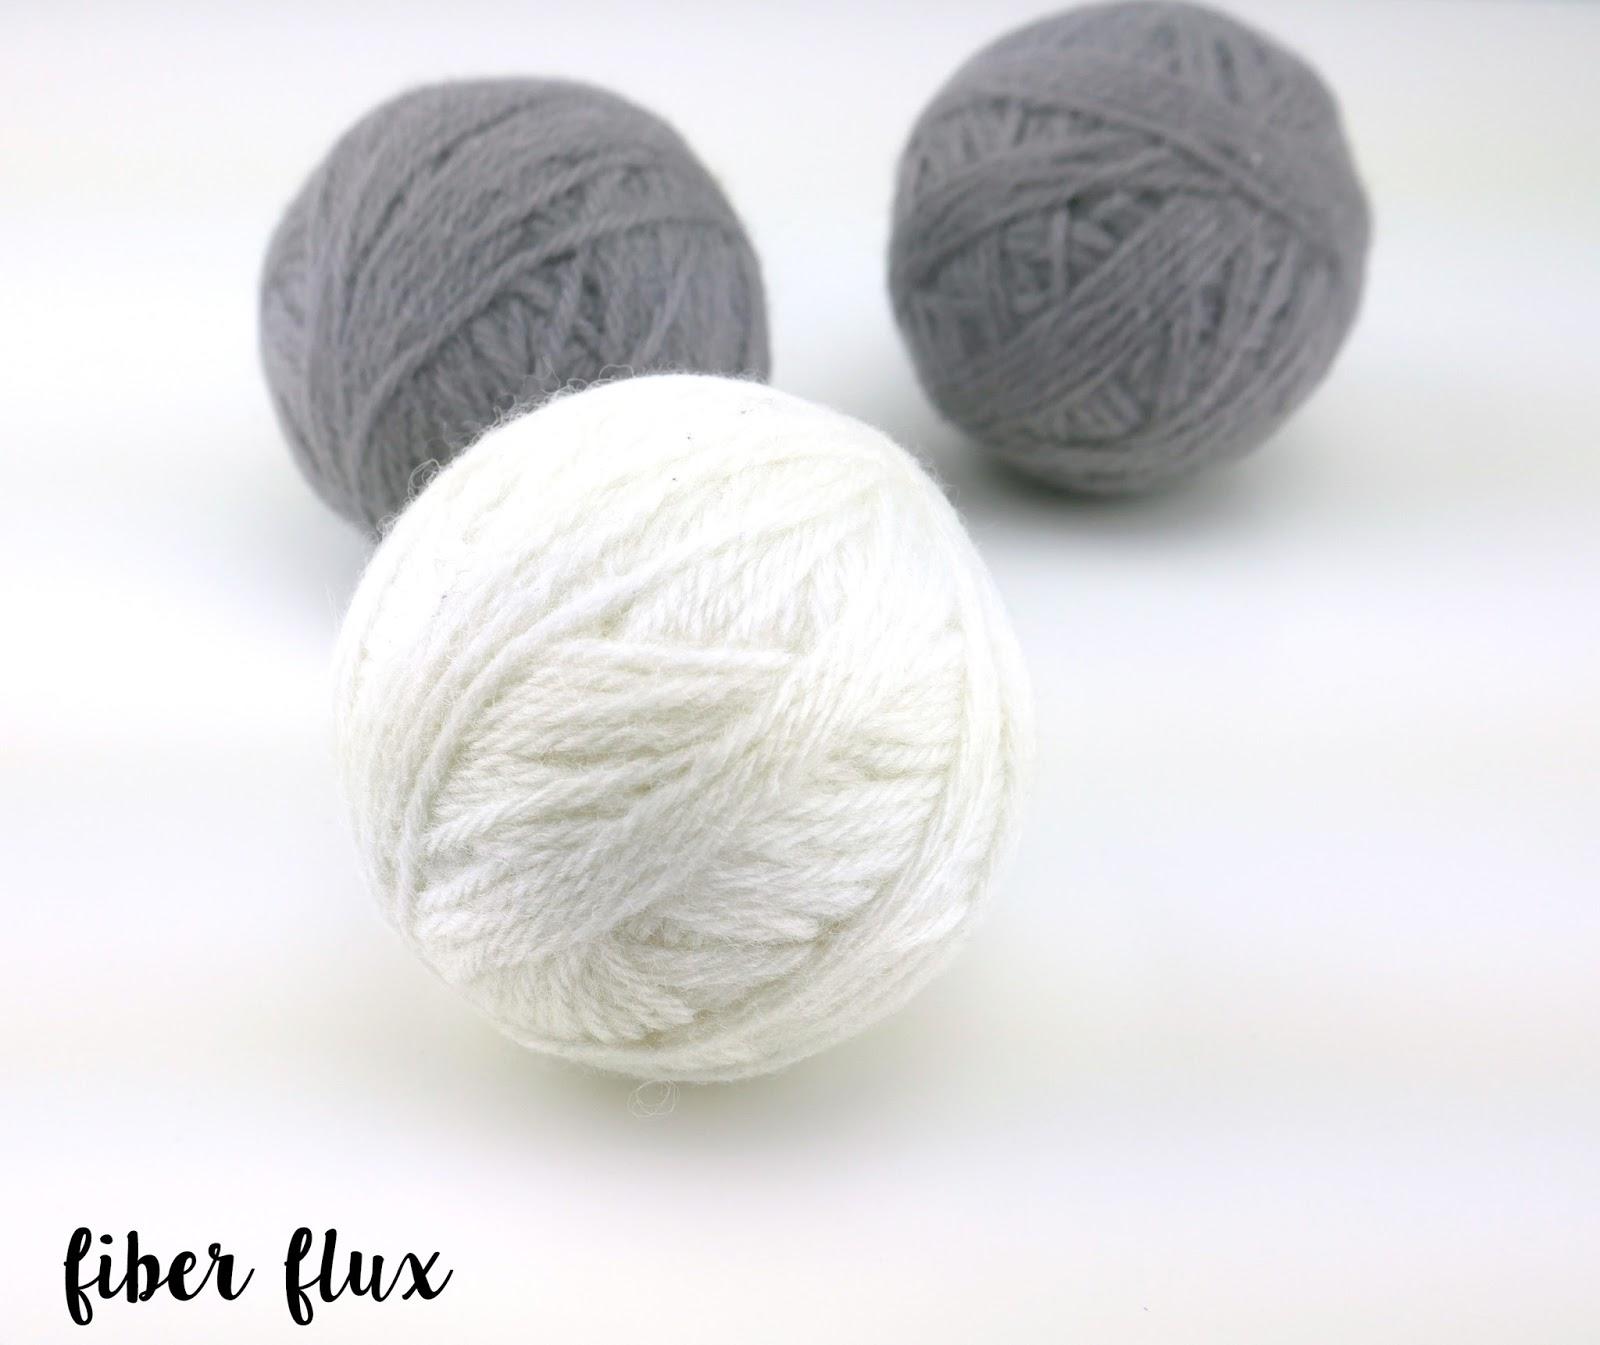 Knitting Pattern For Wool Dryer Balls : Fiber Flux: How To Make Felted Wool Dryer Balls